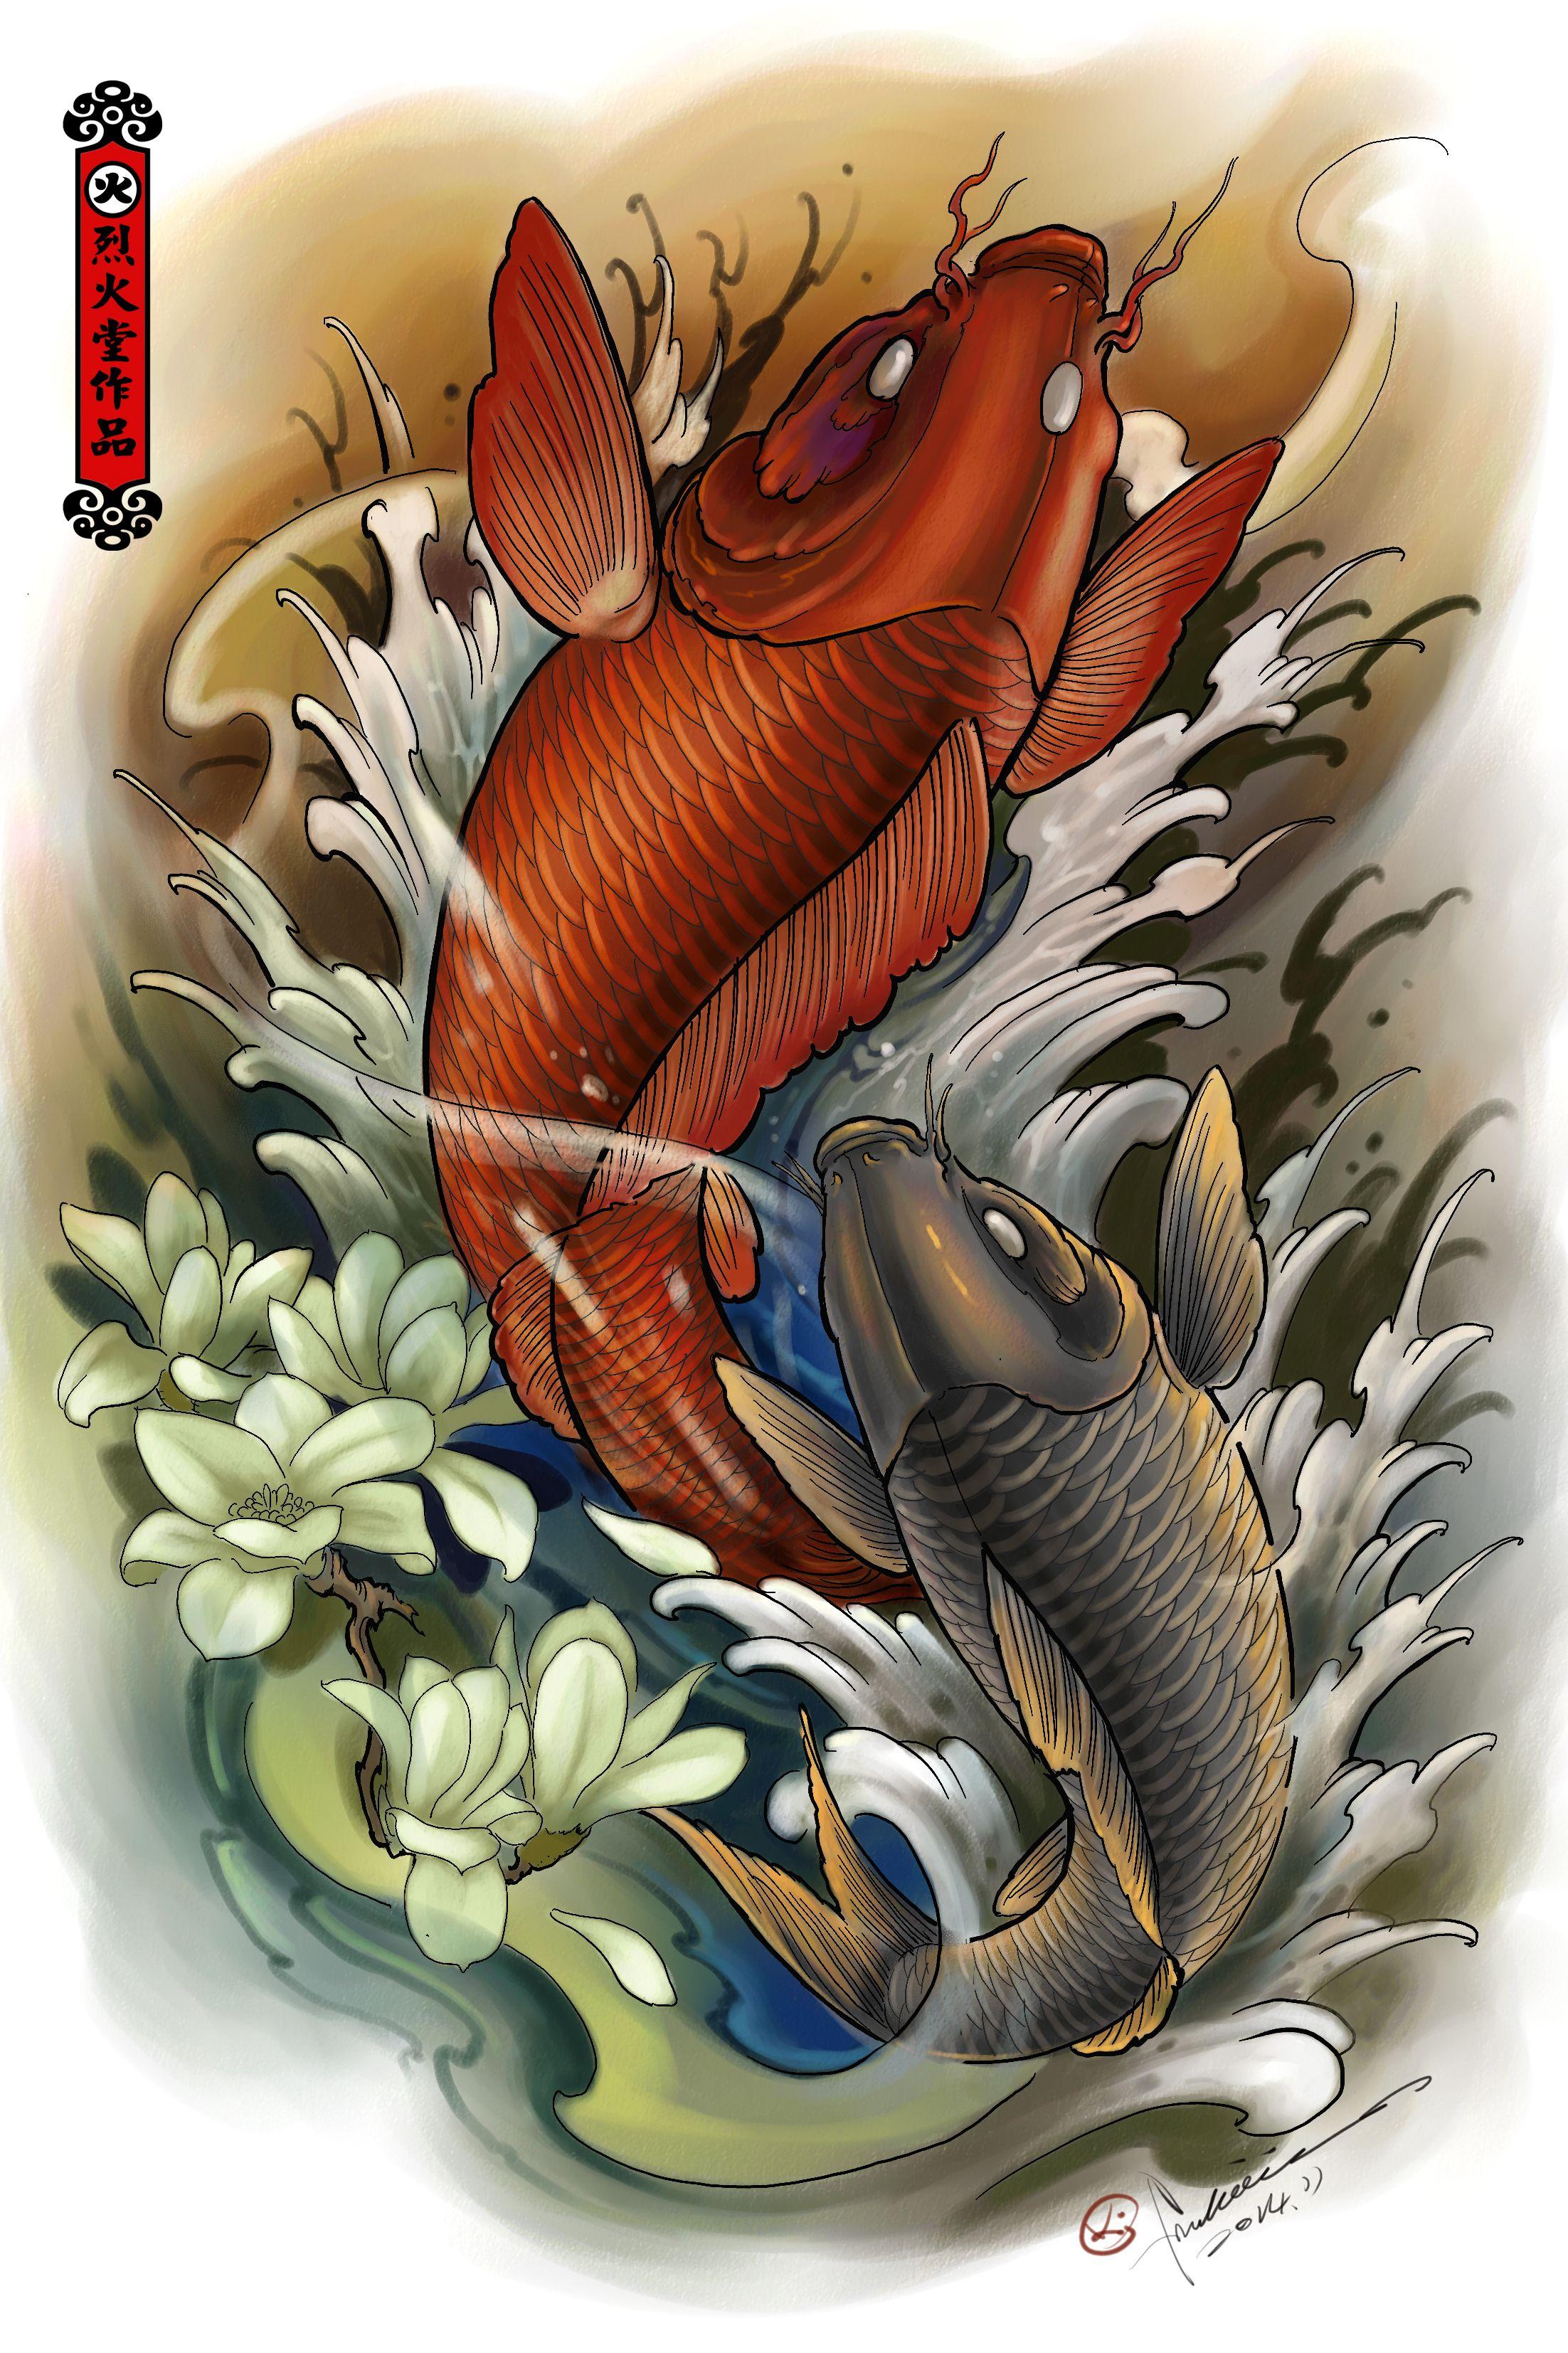 Carp Artwork By Hailin Fu Www Facebook Com Instagram Hailin Tattoo Japanese Tattoo Designs Pisces Tattoo Designs Koi Fish Tattoo